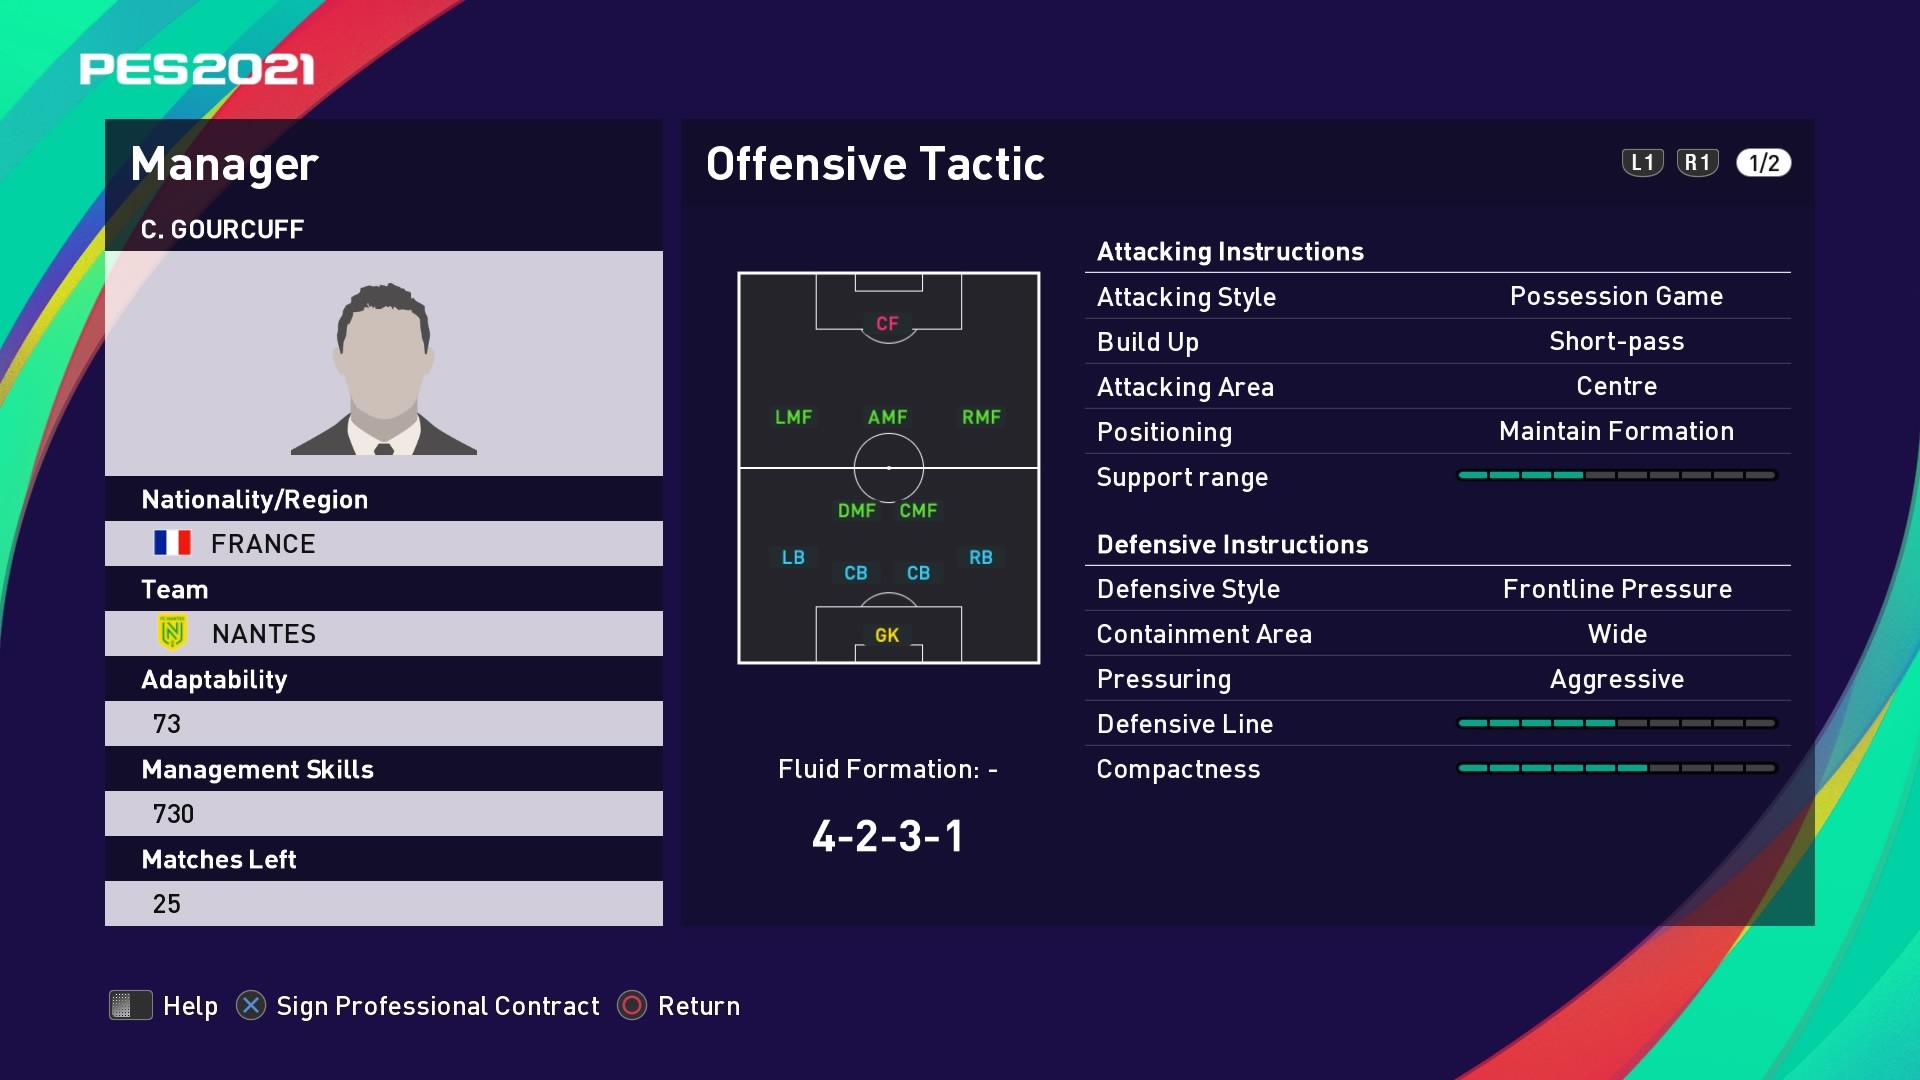 C. Gourcuff (Christian Gourcuff) Offensive Tactic in PES 2021 myClub